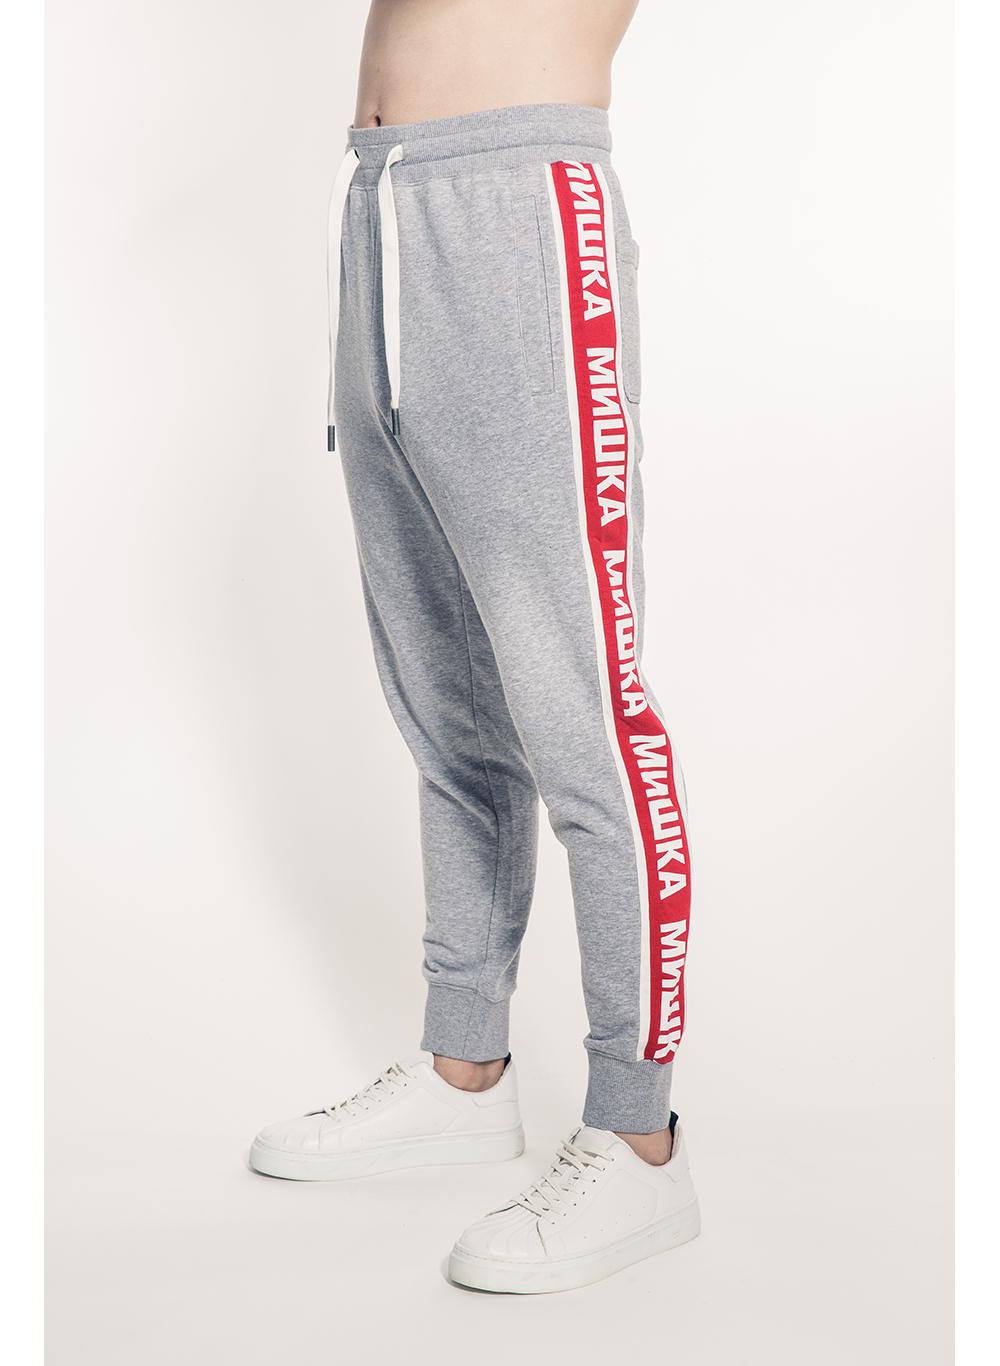 Cyrillic Stripe Sweatpants